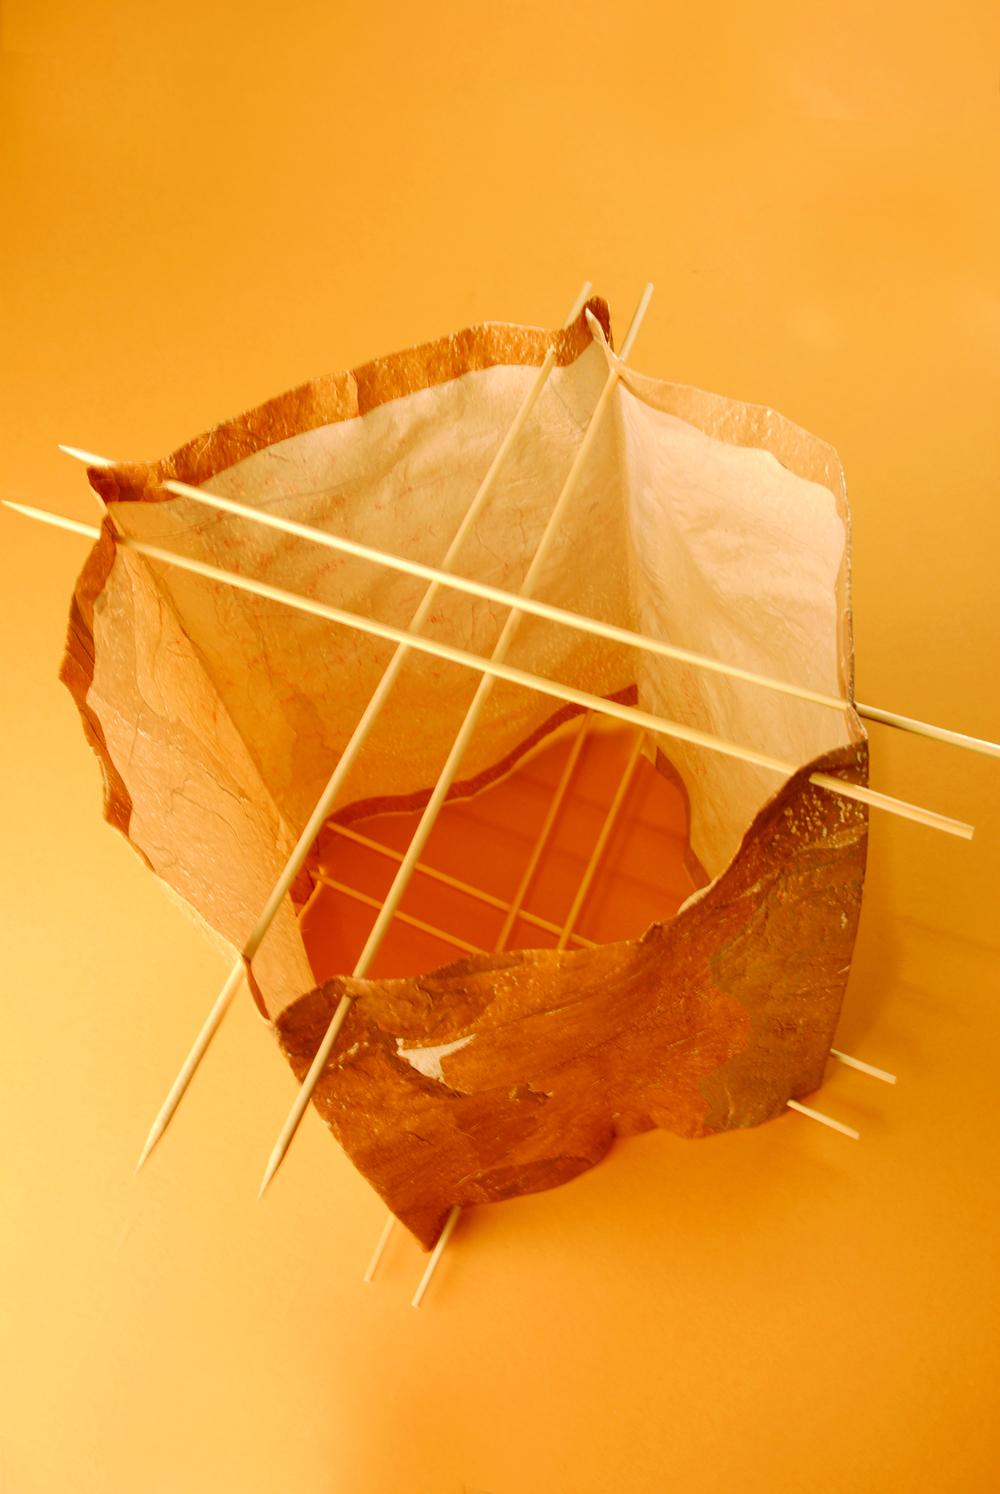 plastic bag top view struts.jpg